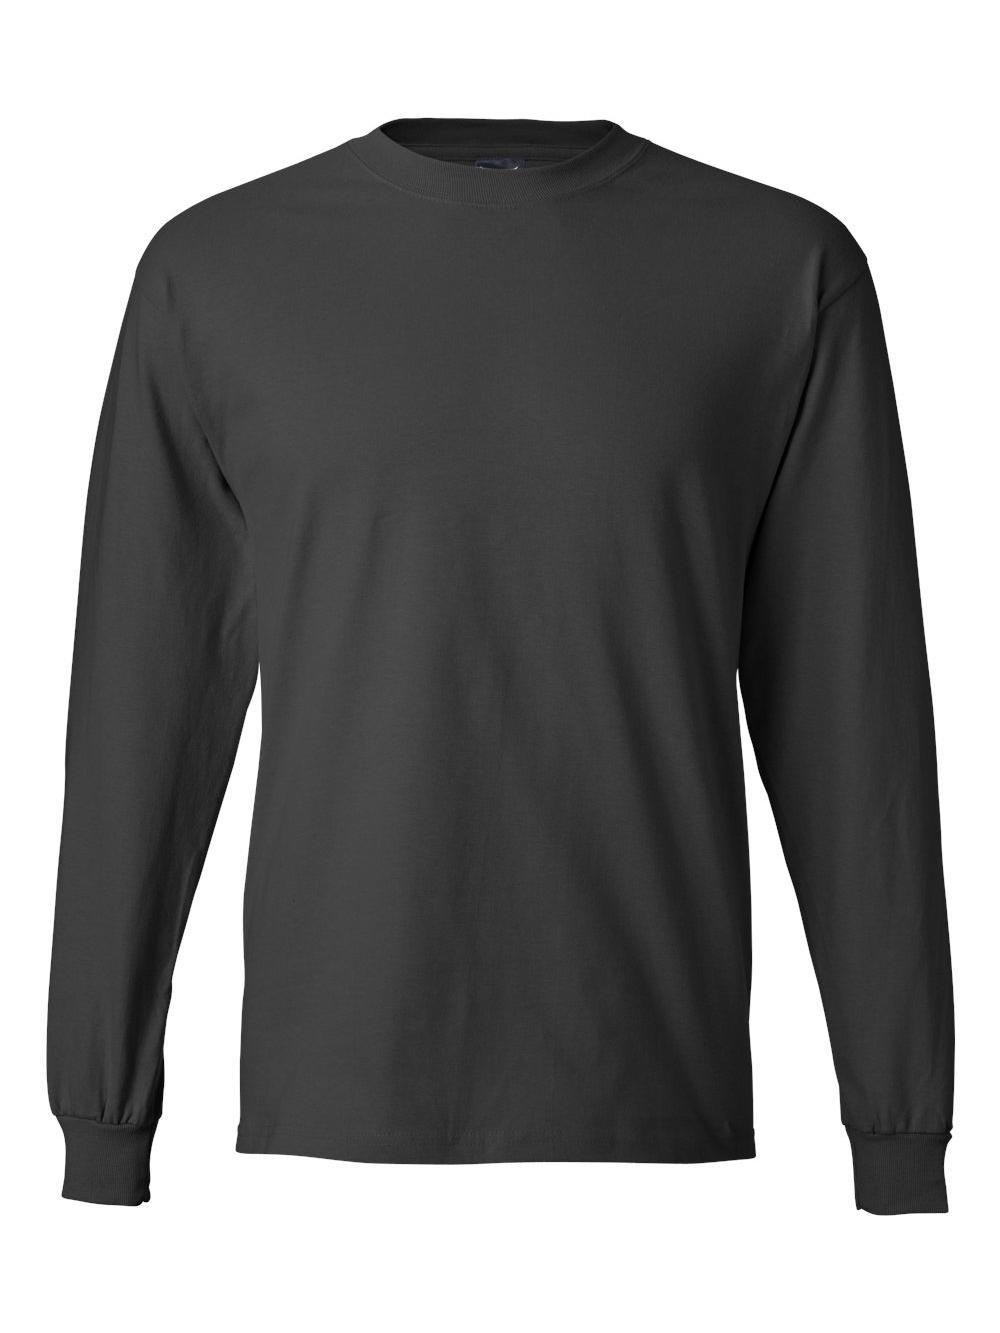 Hanes-Beefy-T-Long-Sleeve-T-Shirt-5186 thumbnail 48